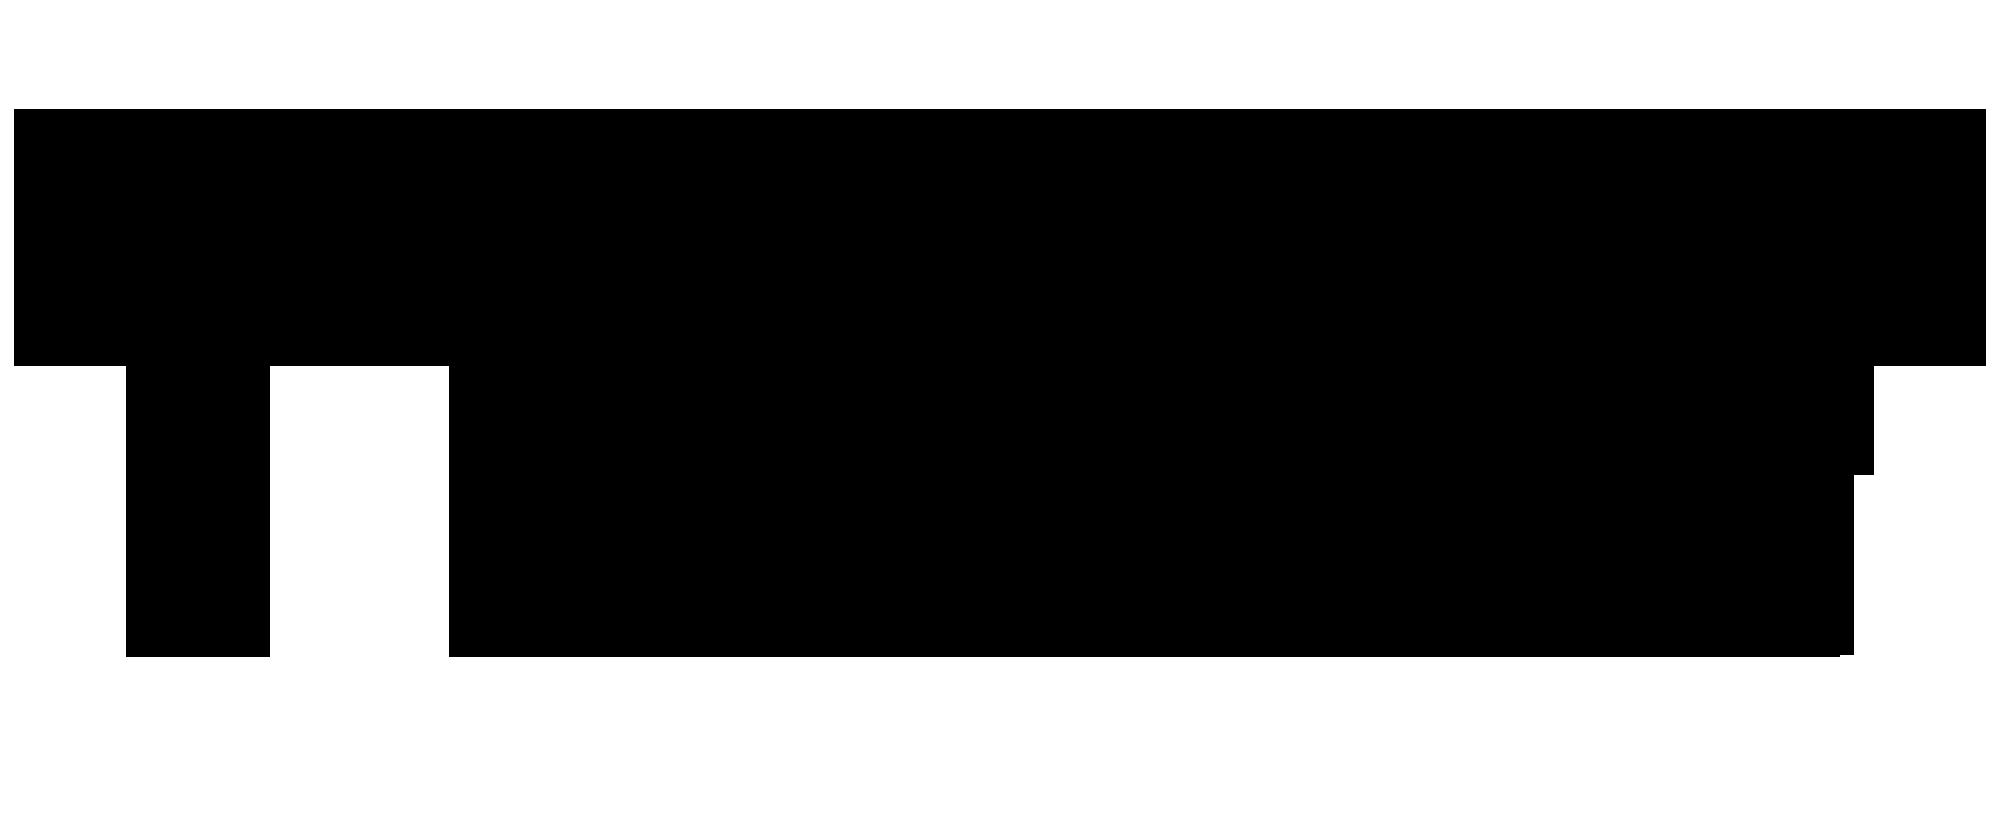 Yeezy-Logo